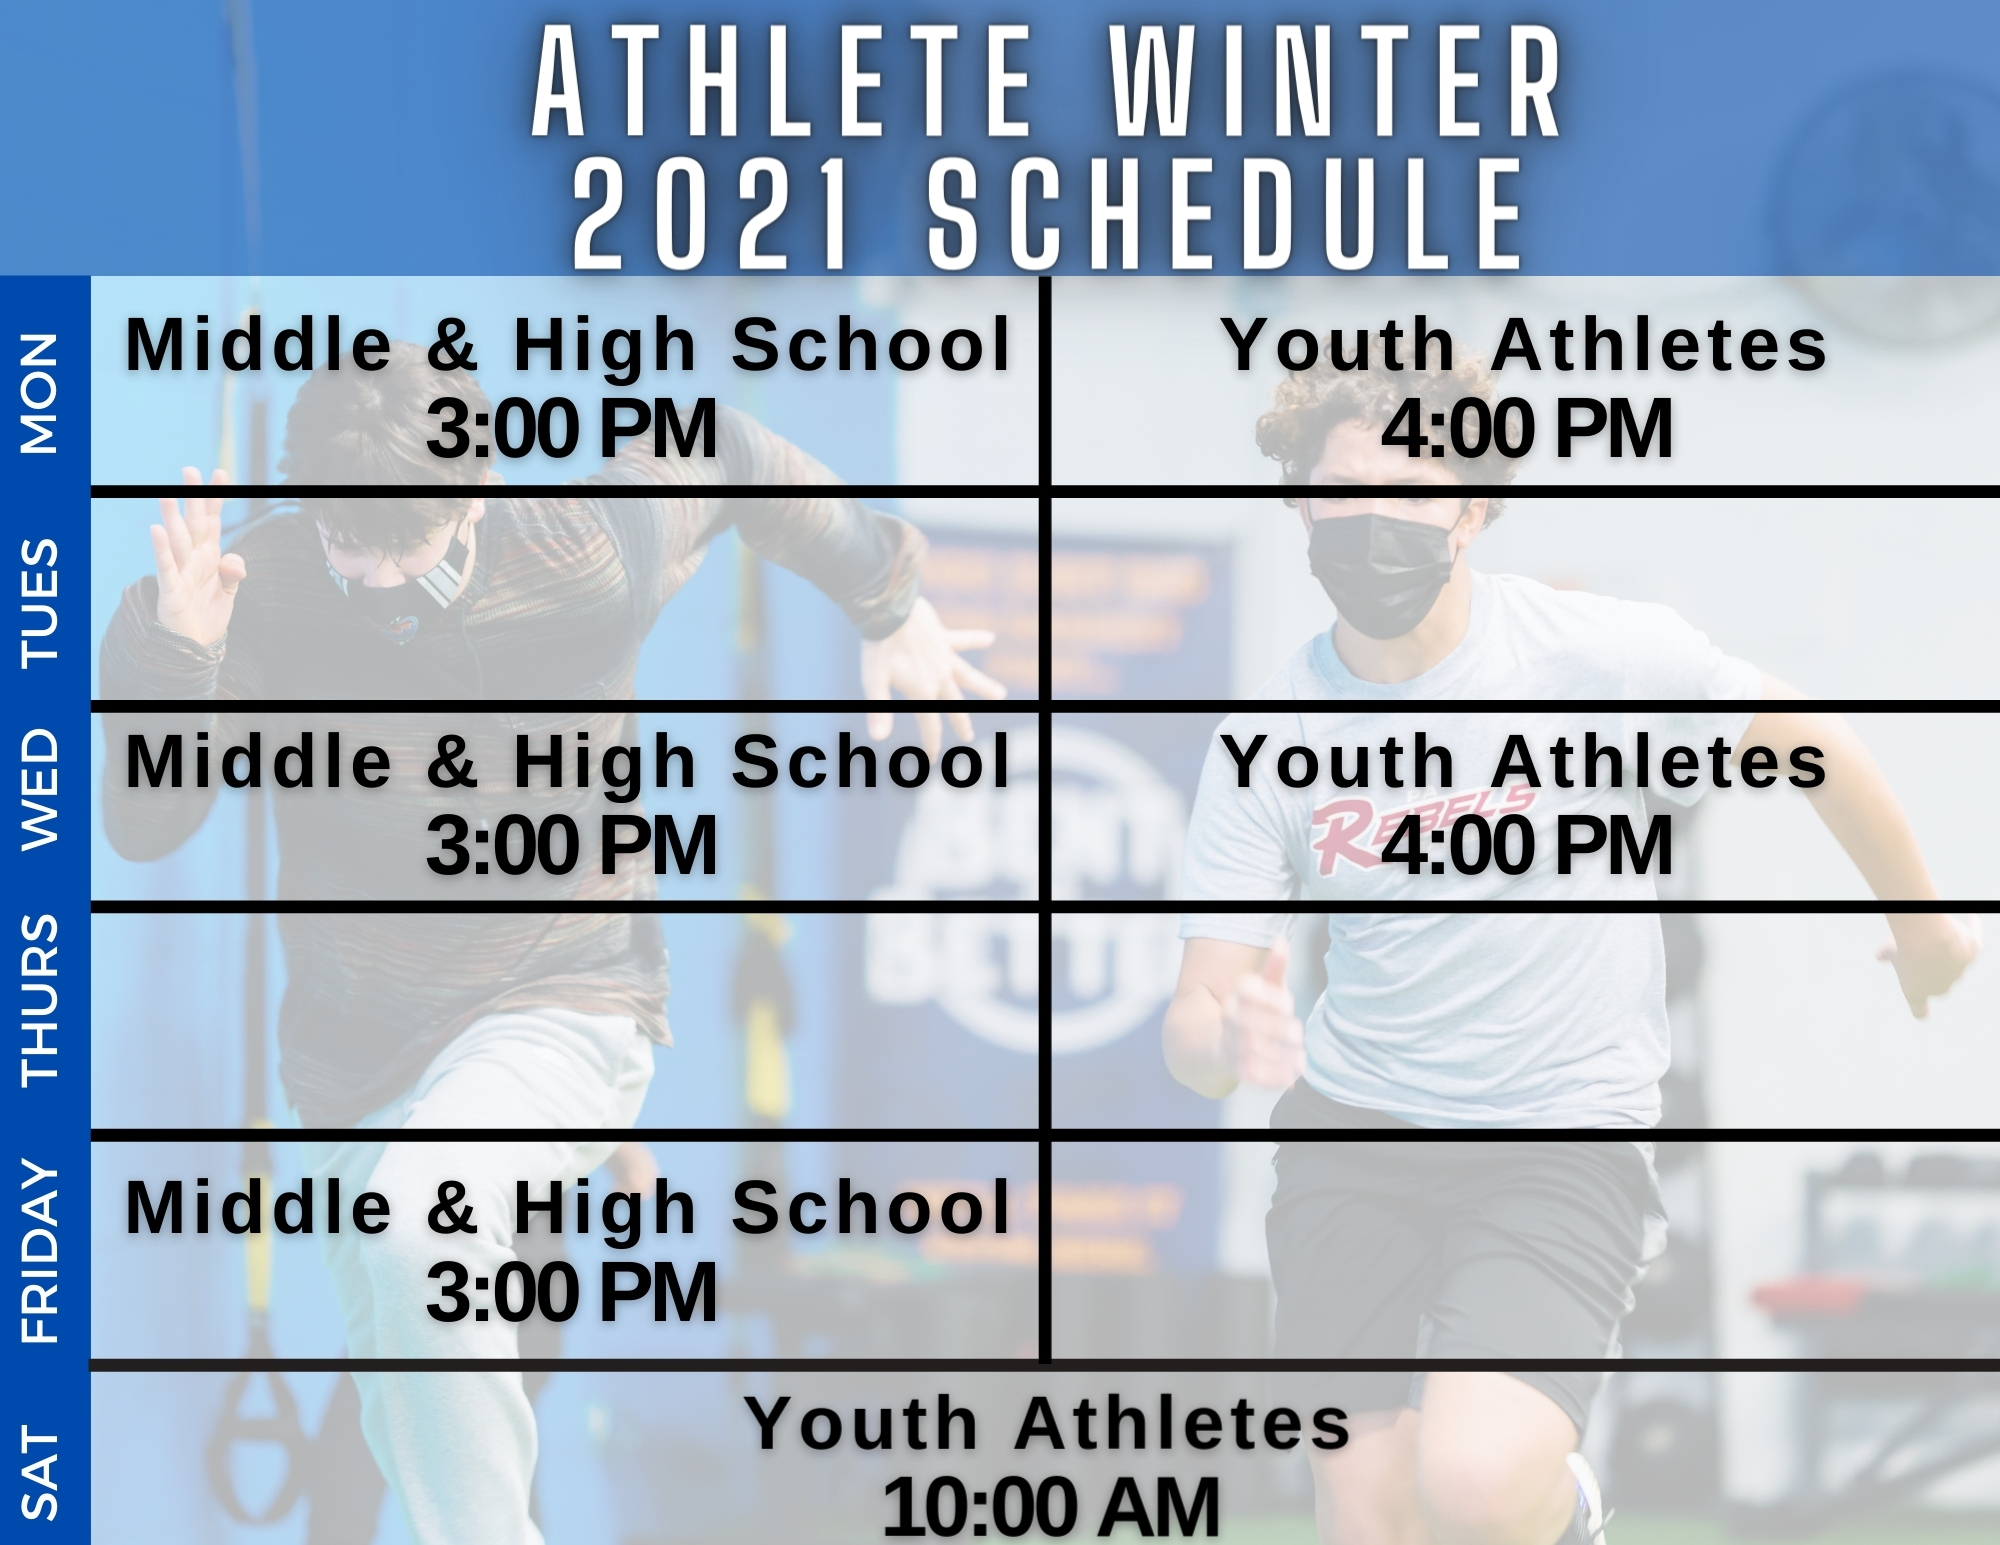 Training Schedule Bent On Better Athletes Winter 2021